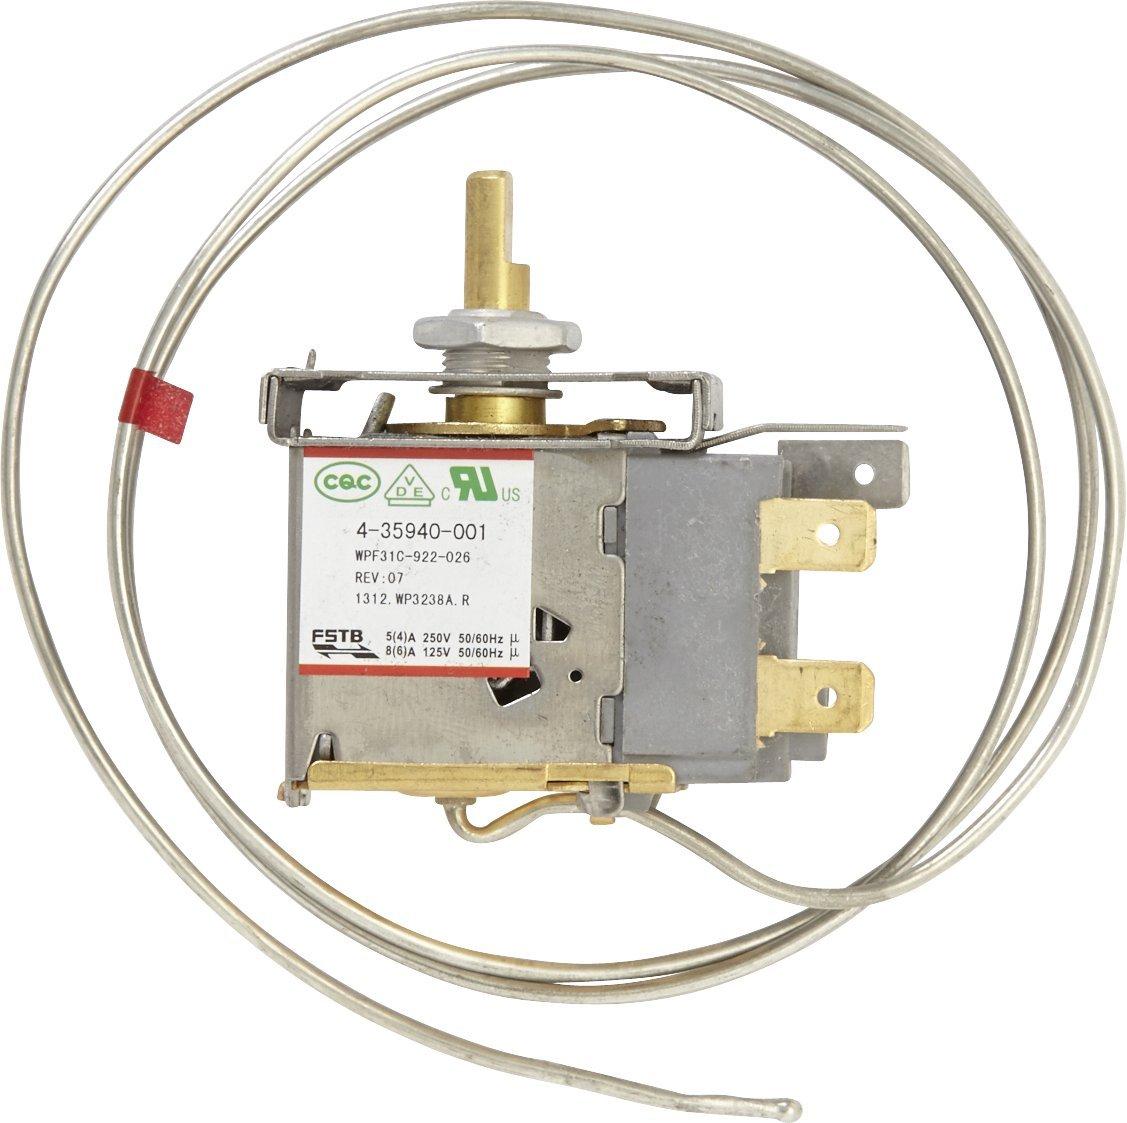 Whirlpool 4-35940-001 Thermostat Freezer